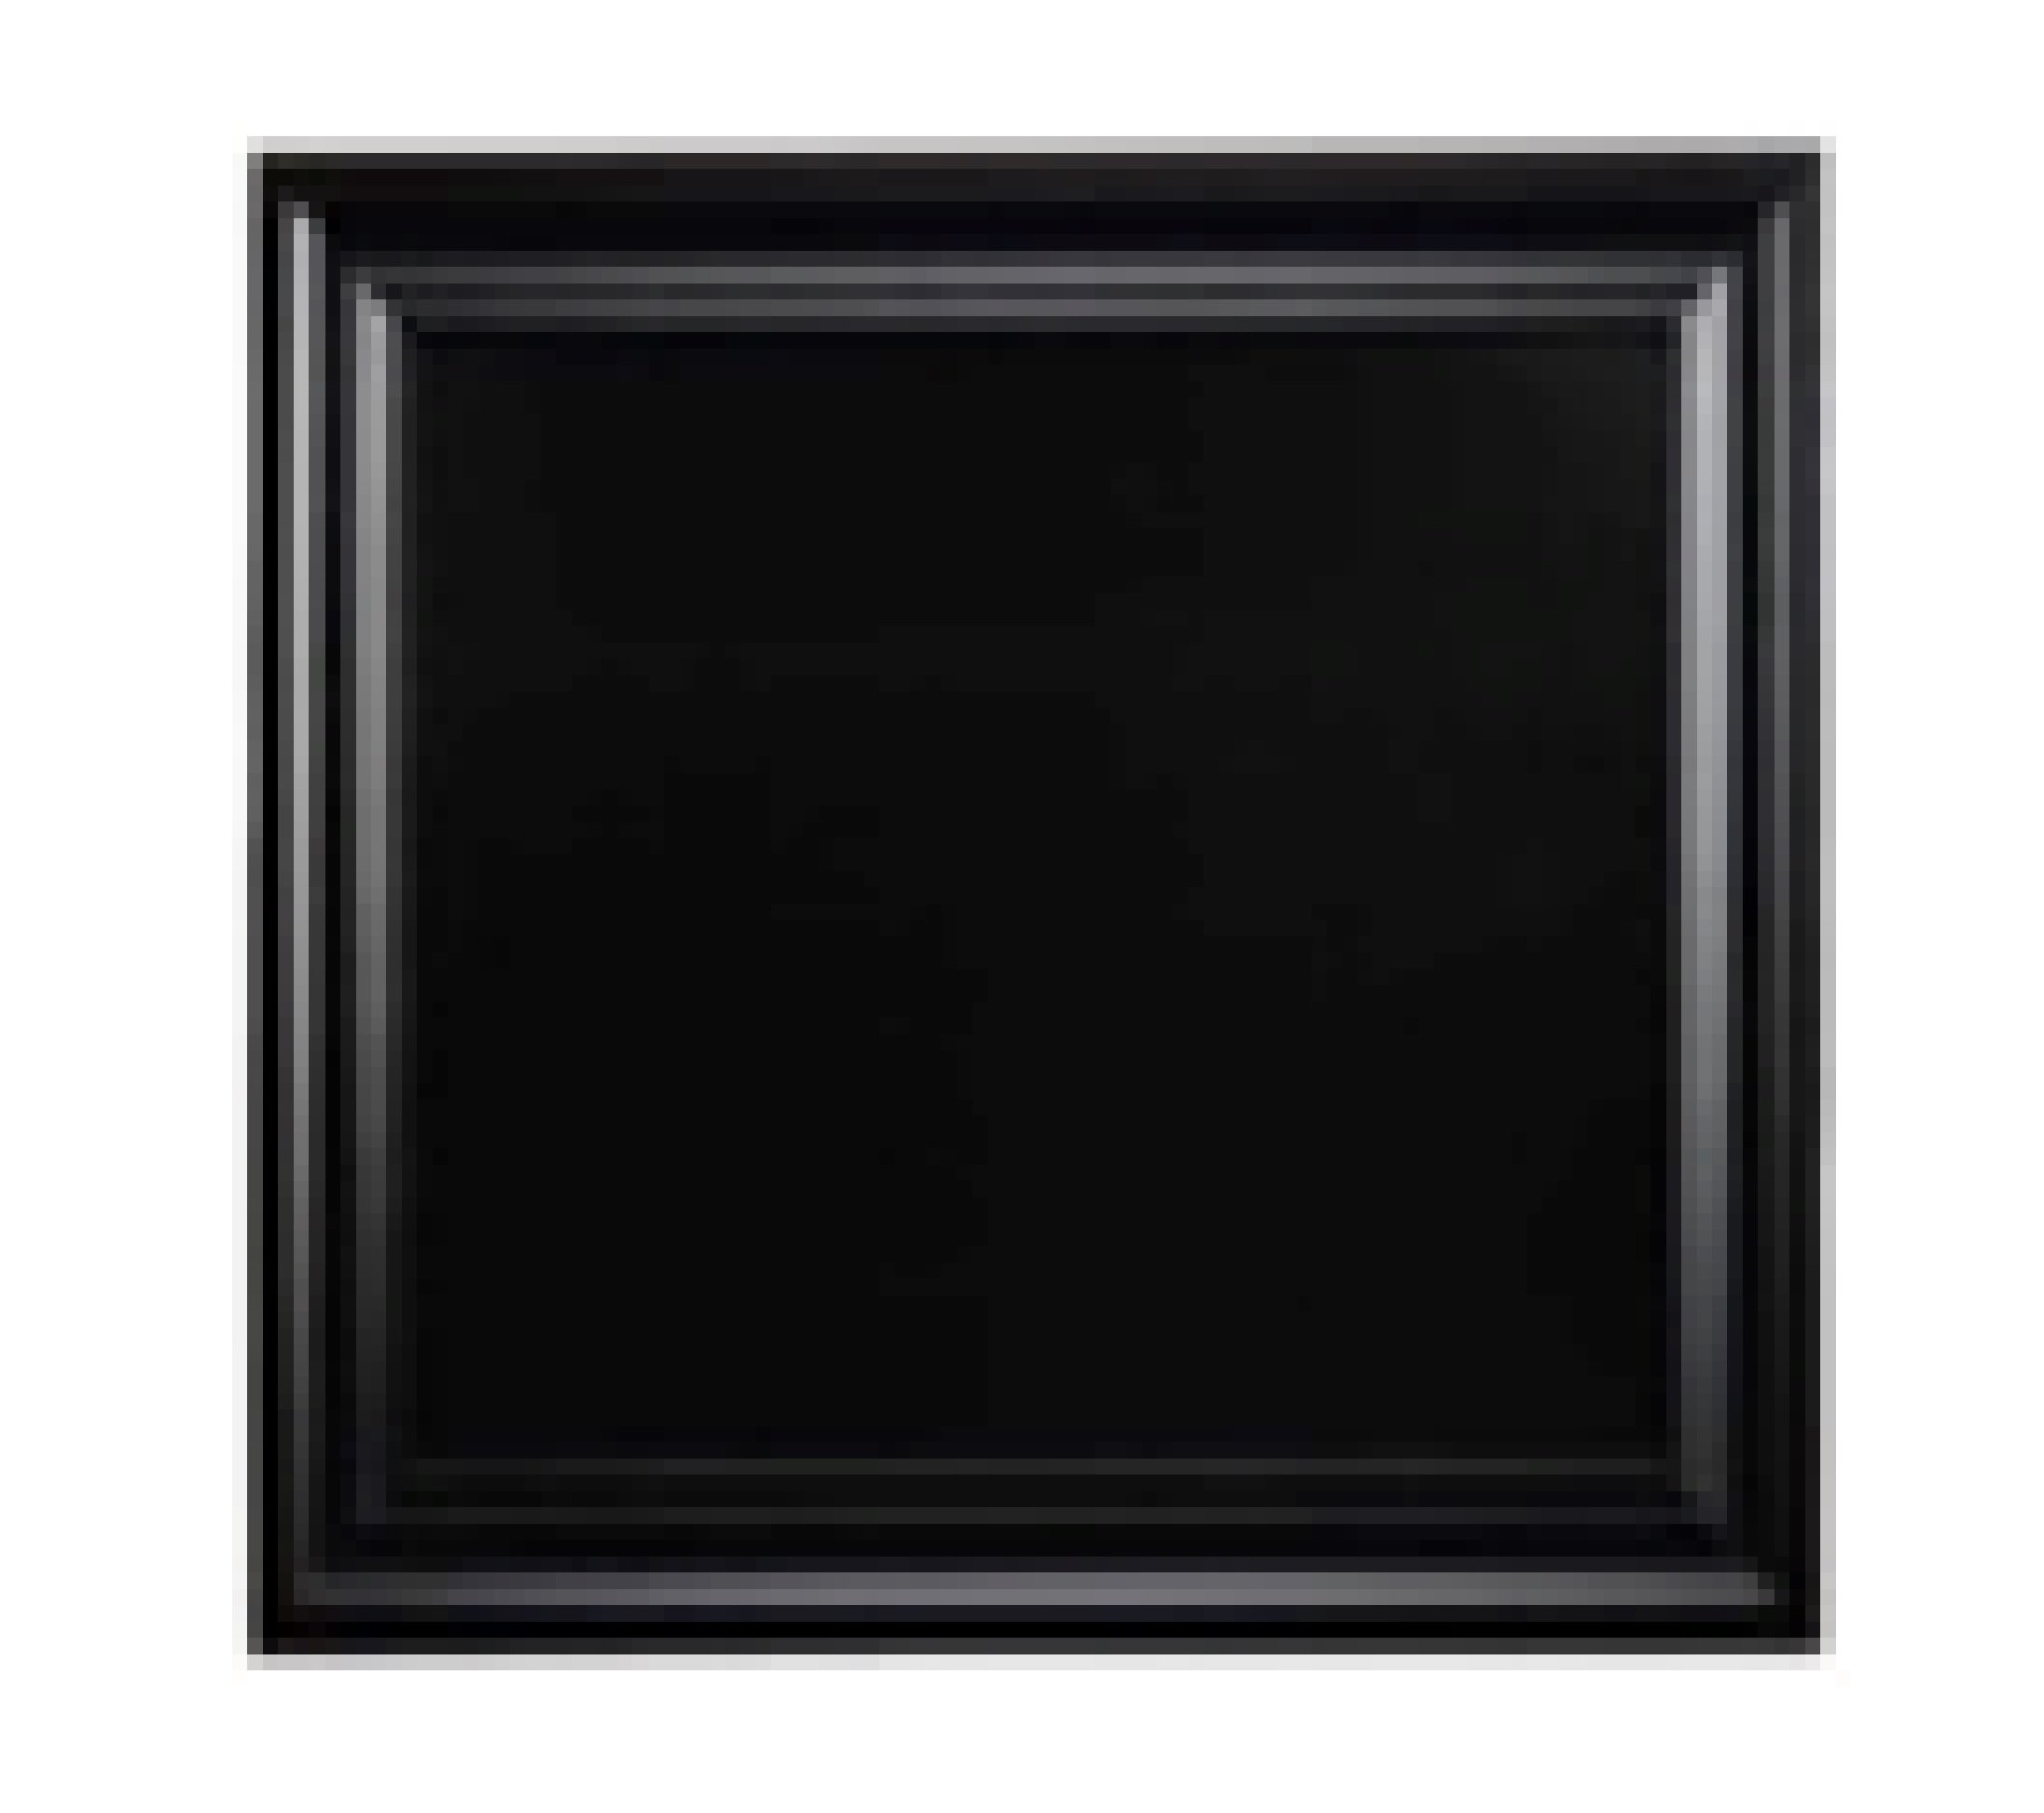 Linon AMX-3024CHBLK-1 Chalkboard with Black Frame, 24 by 30'', 24 x 30, Black